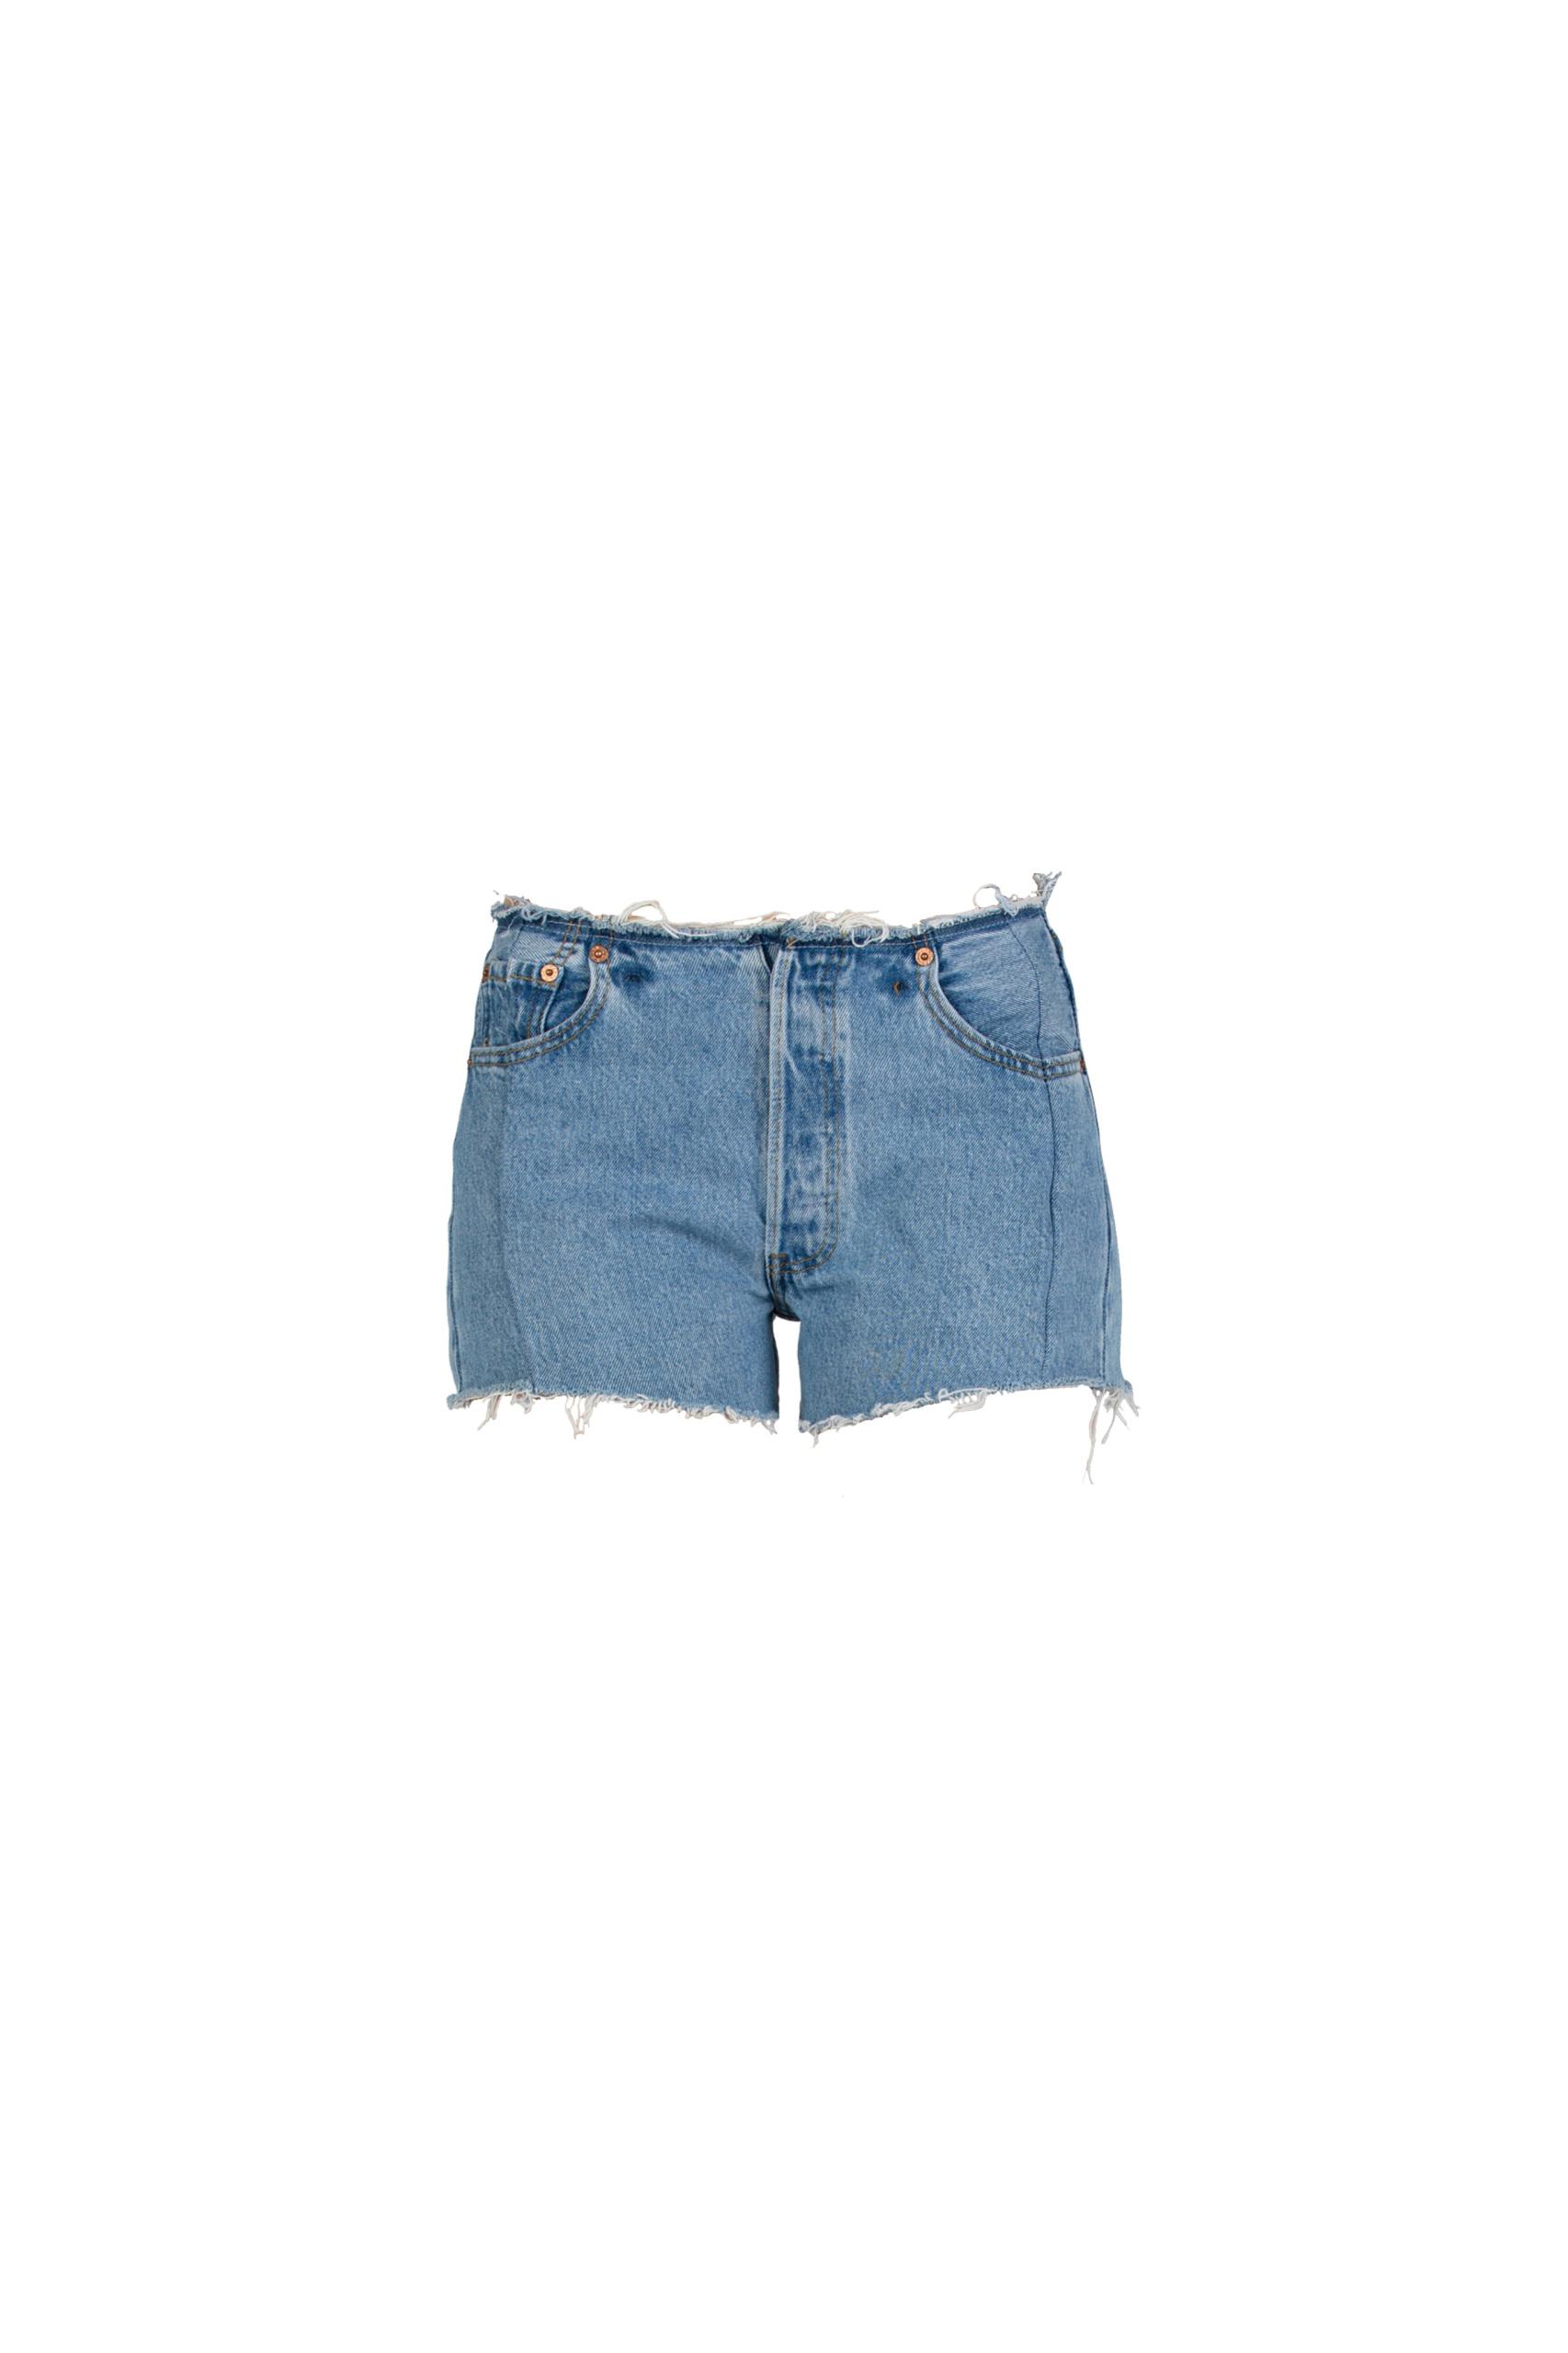 Bandless Shorts by EB Denim, available on ebdenim.com for $227 Hailey Baldwin Shorts SIMILAR PRODUCT